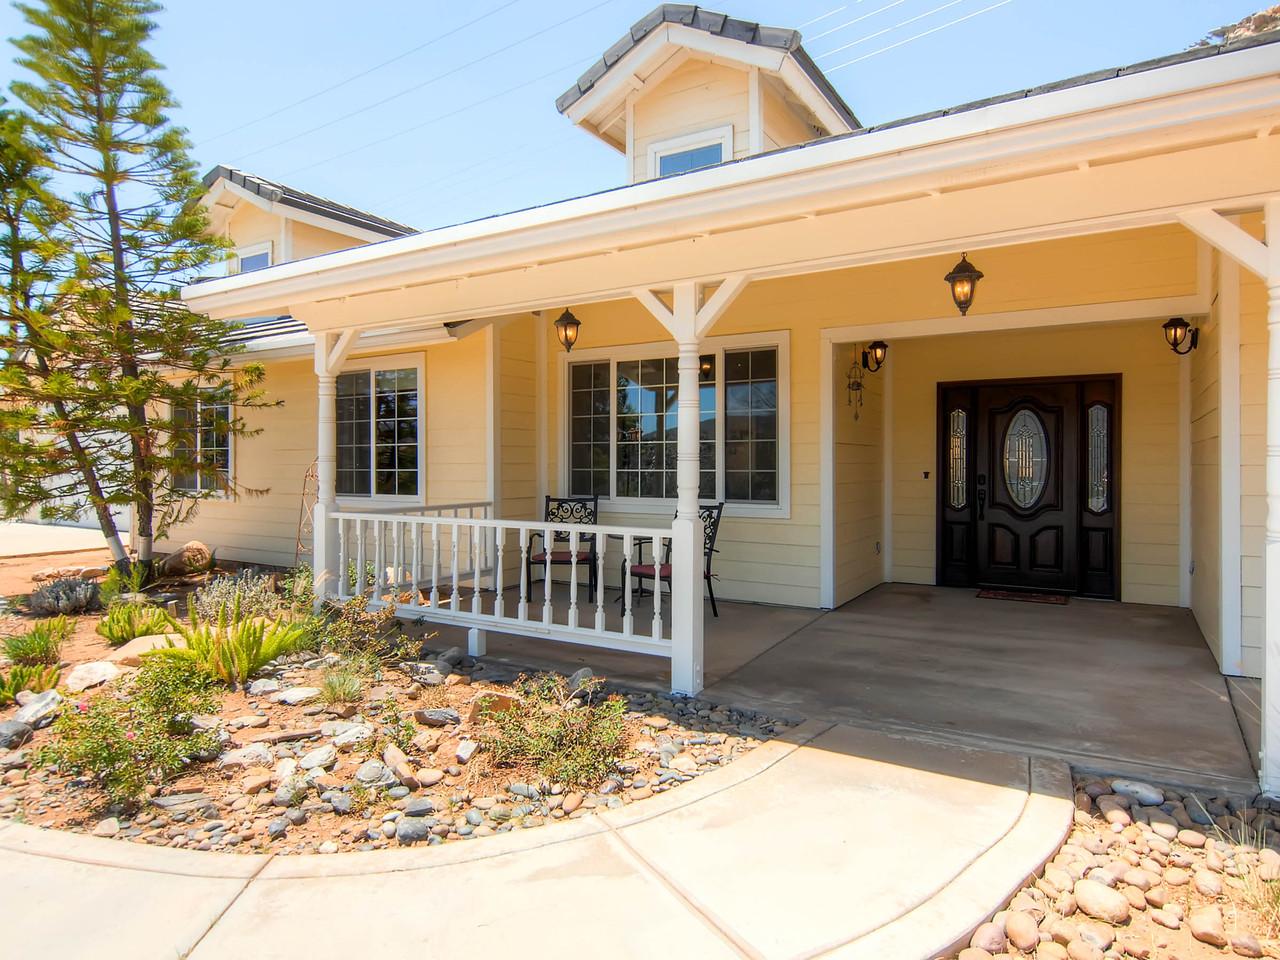 Single Family Home for Sale at 1008 Matamo El Cajon, California 92019 United States